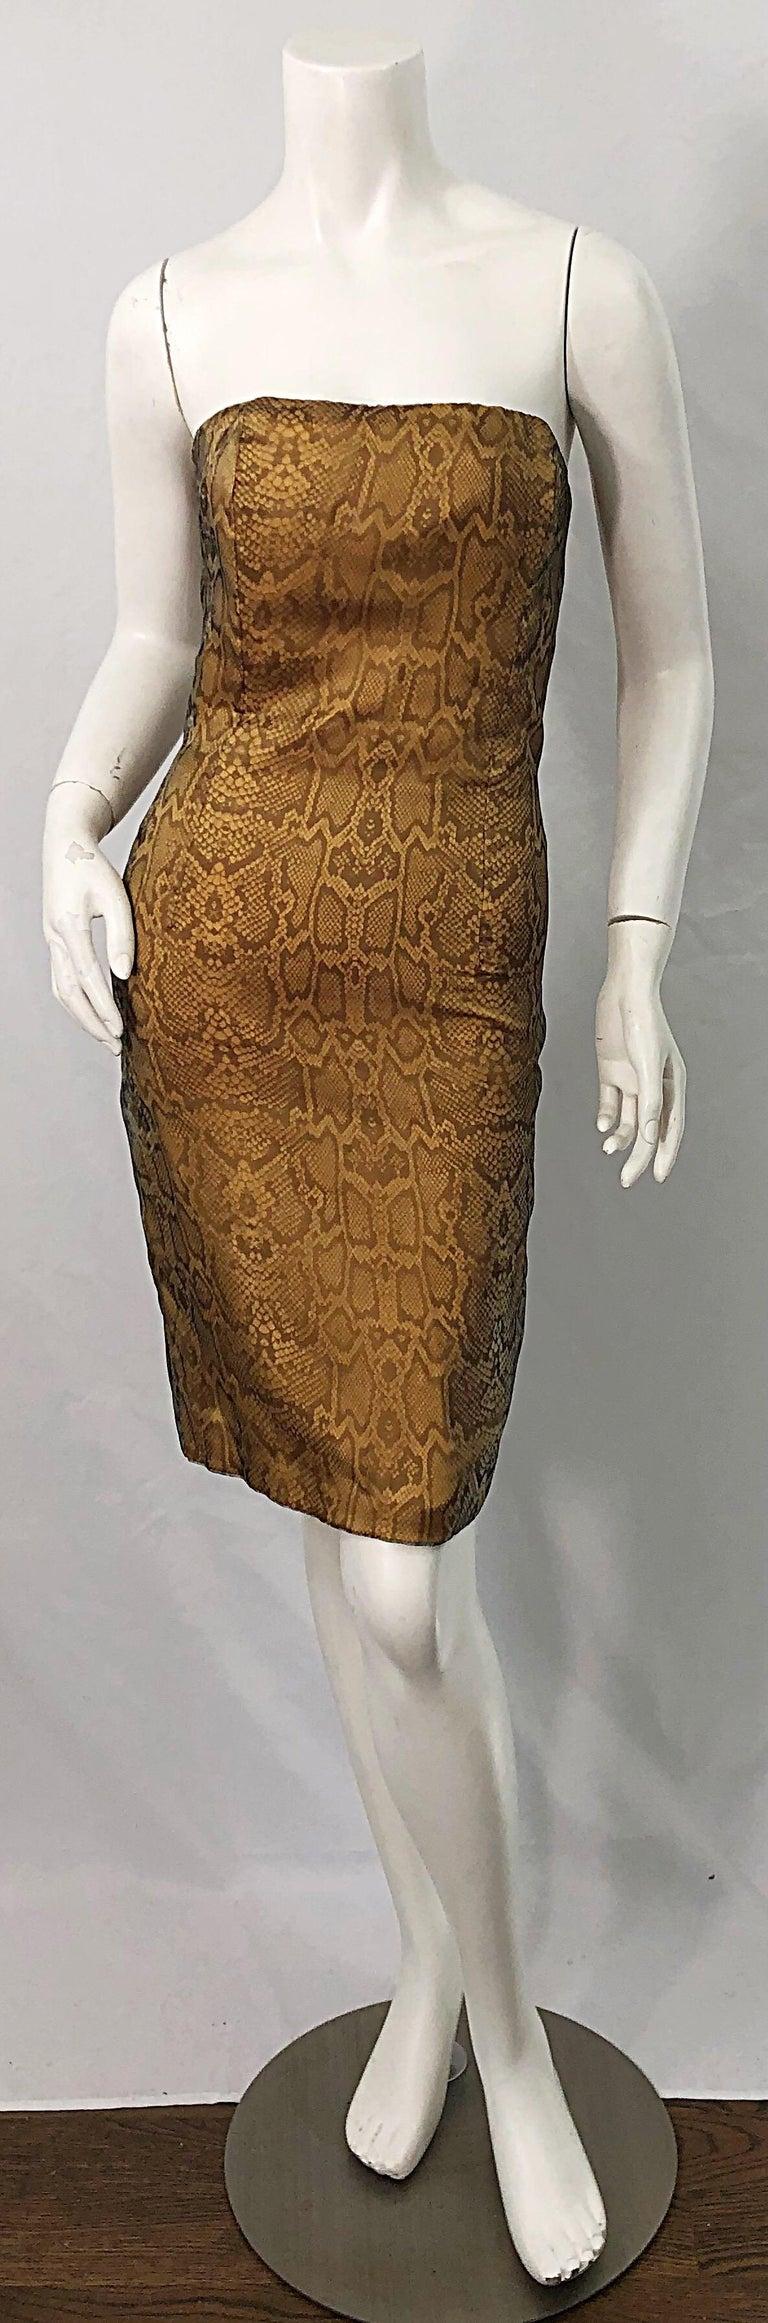 1990s Luca Luca Size 42 / 6 Snakeskin Silk Organza Strapless 90s Tan Brown Dress For Sale 11